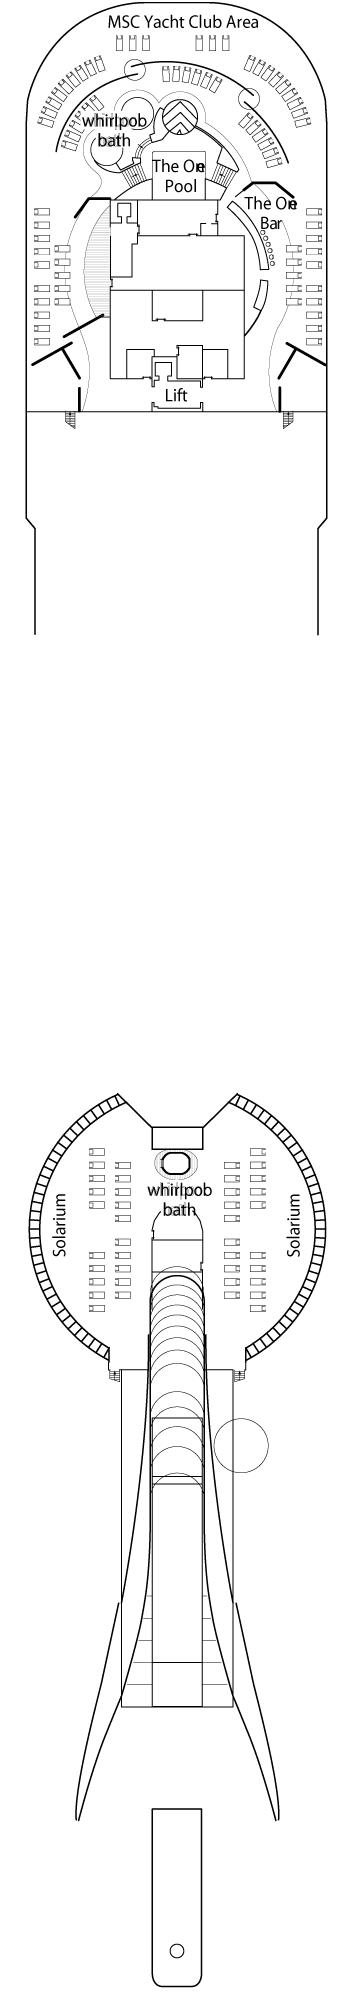 MSC Fantasia - Sun Deck